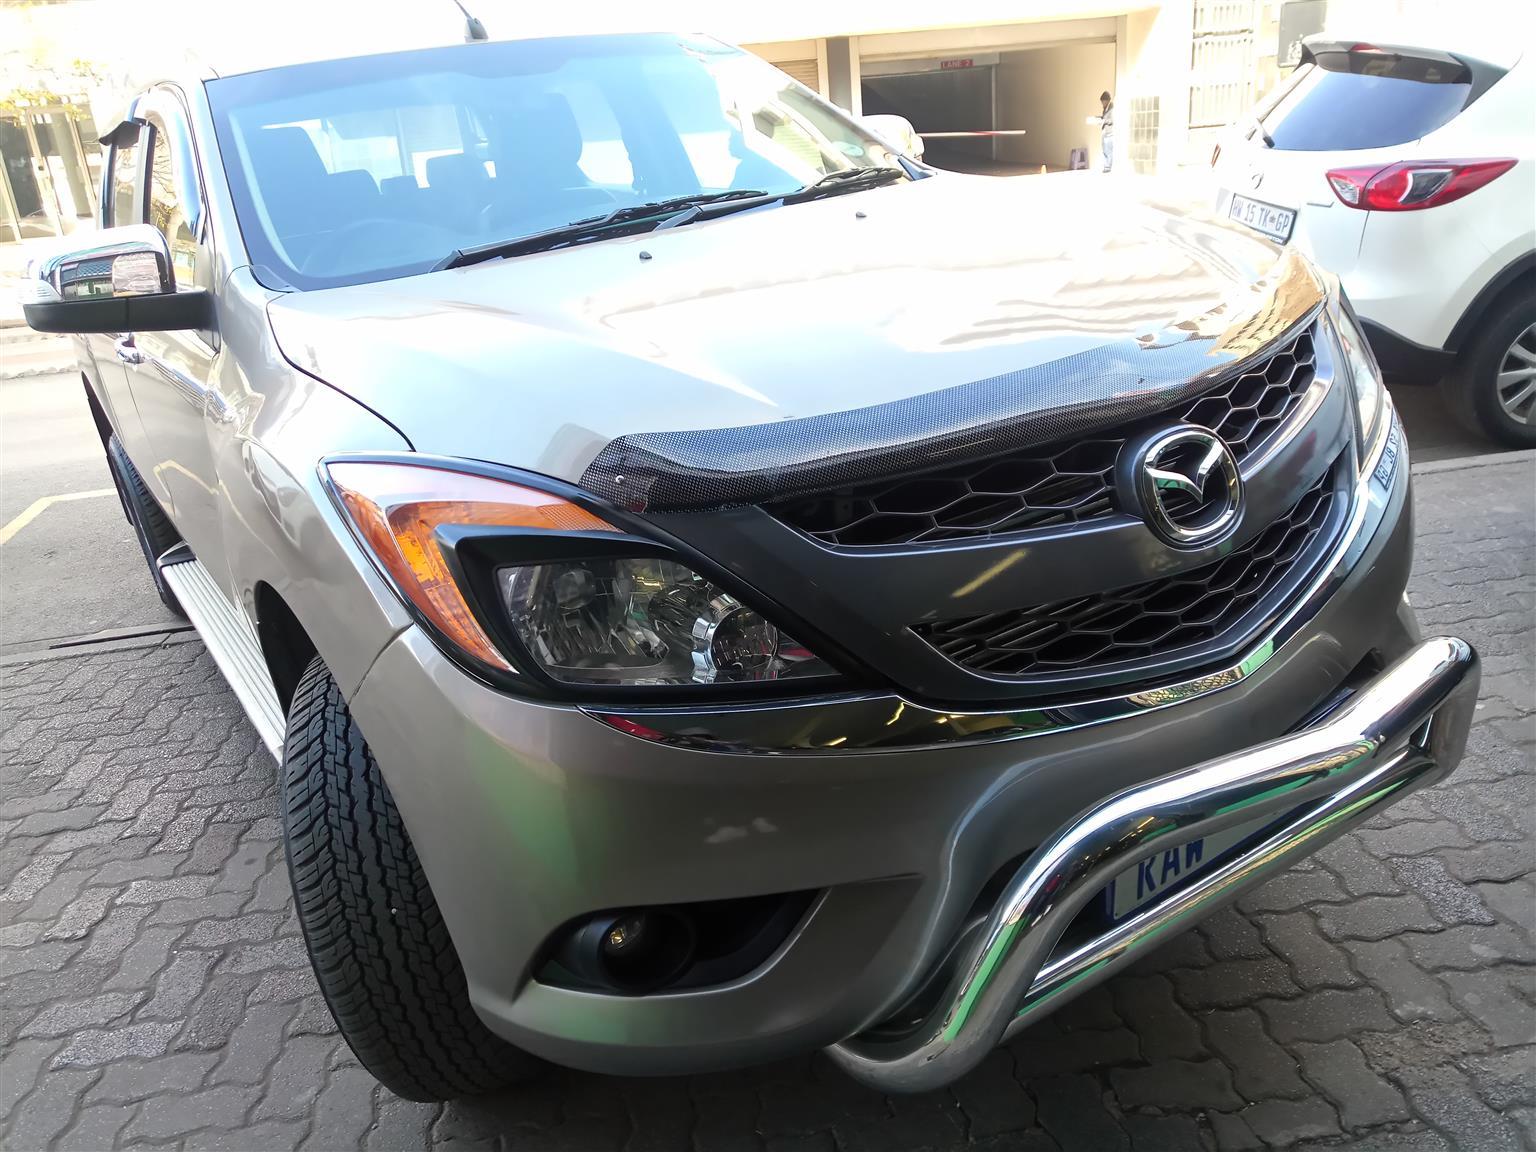 2018 Mazda BT-50 3.0CRD double cab SLE